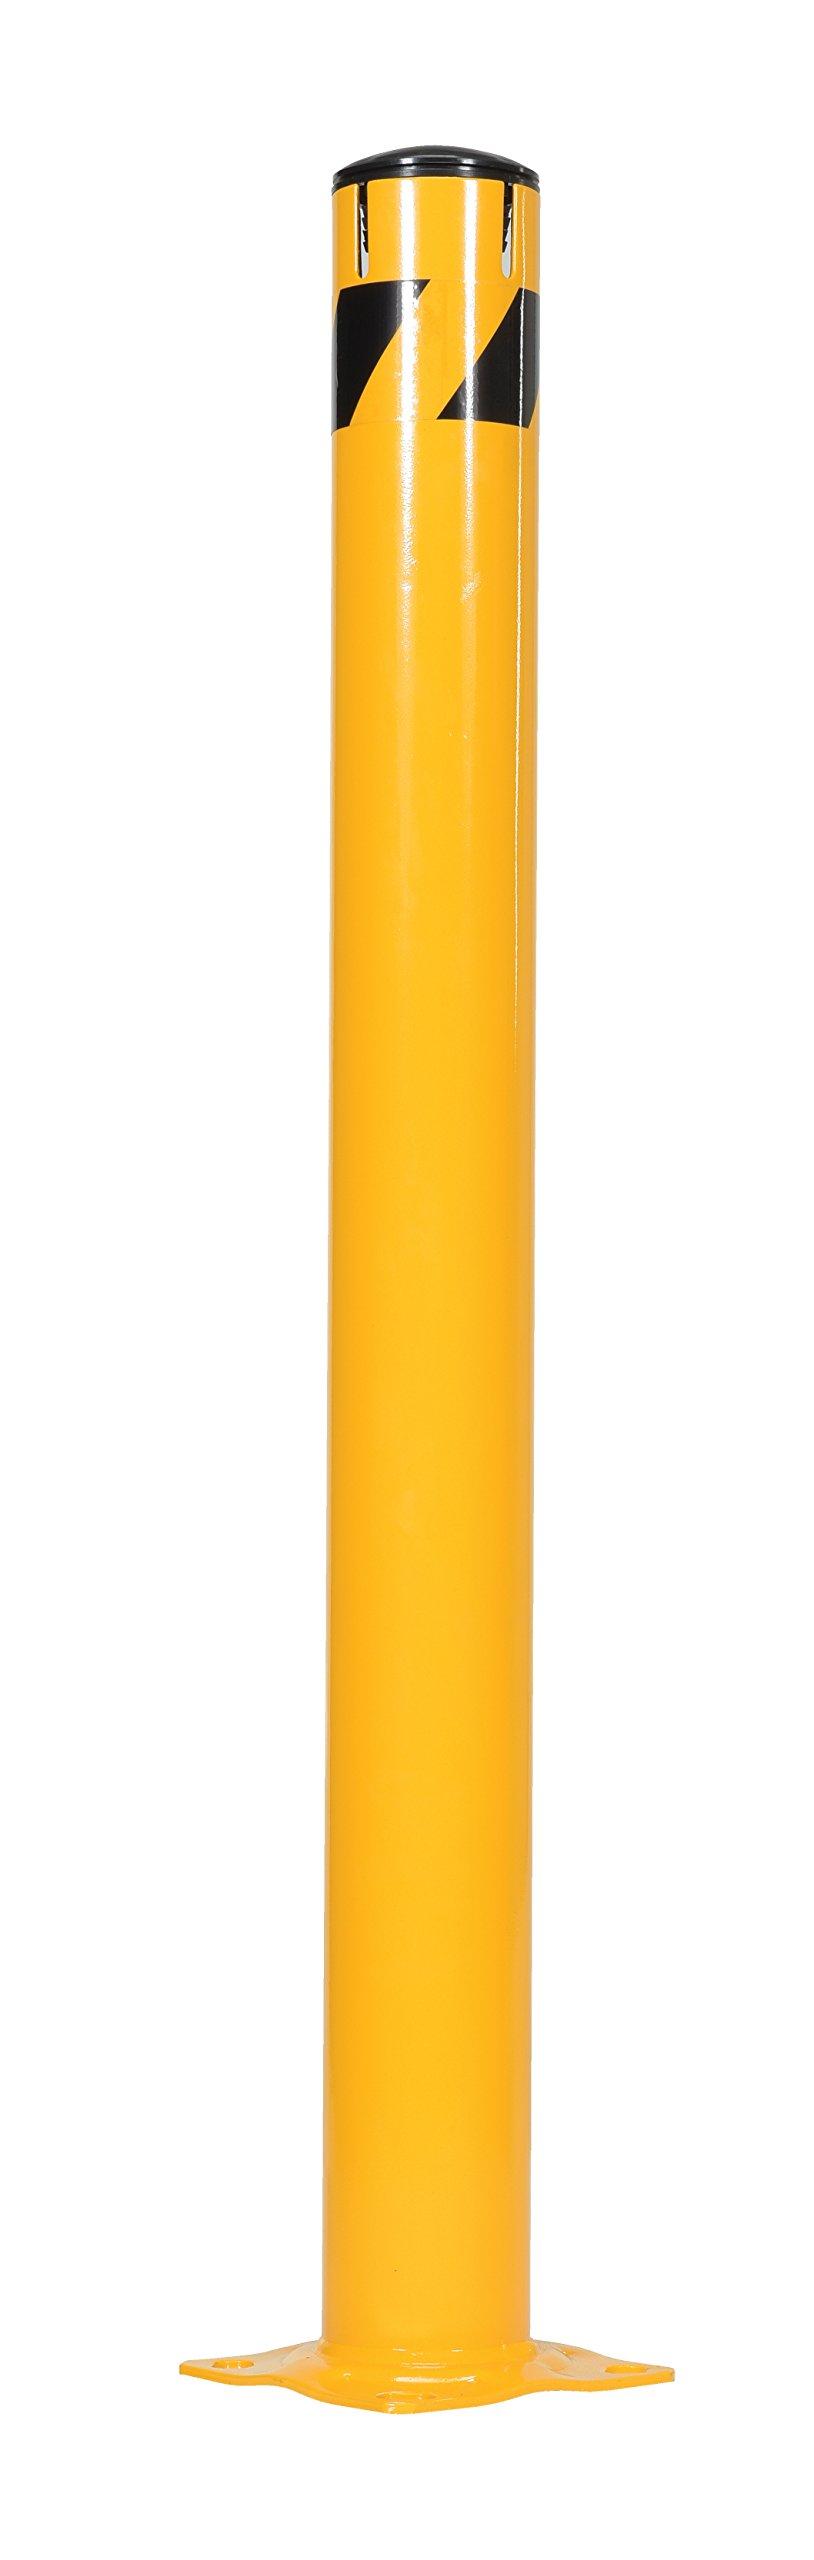 Vestil BOL-JK-48-4.5 Steel Pipe Bollard with Slots, 48'' x 4.5'', Yellow